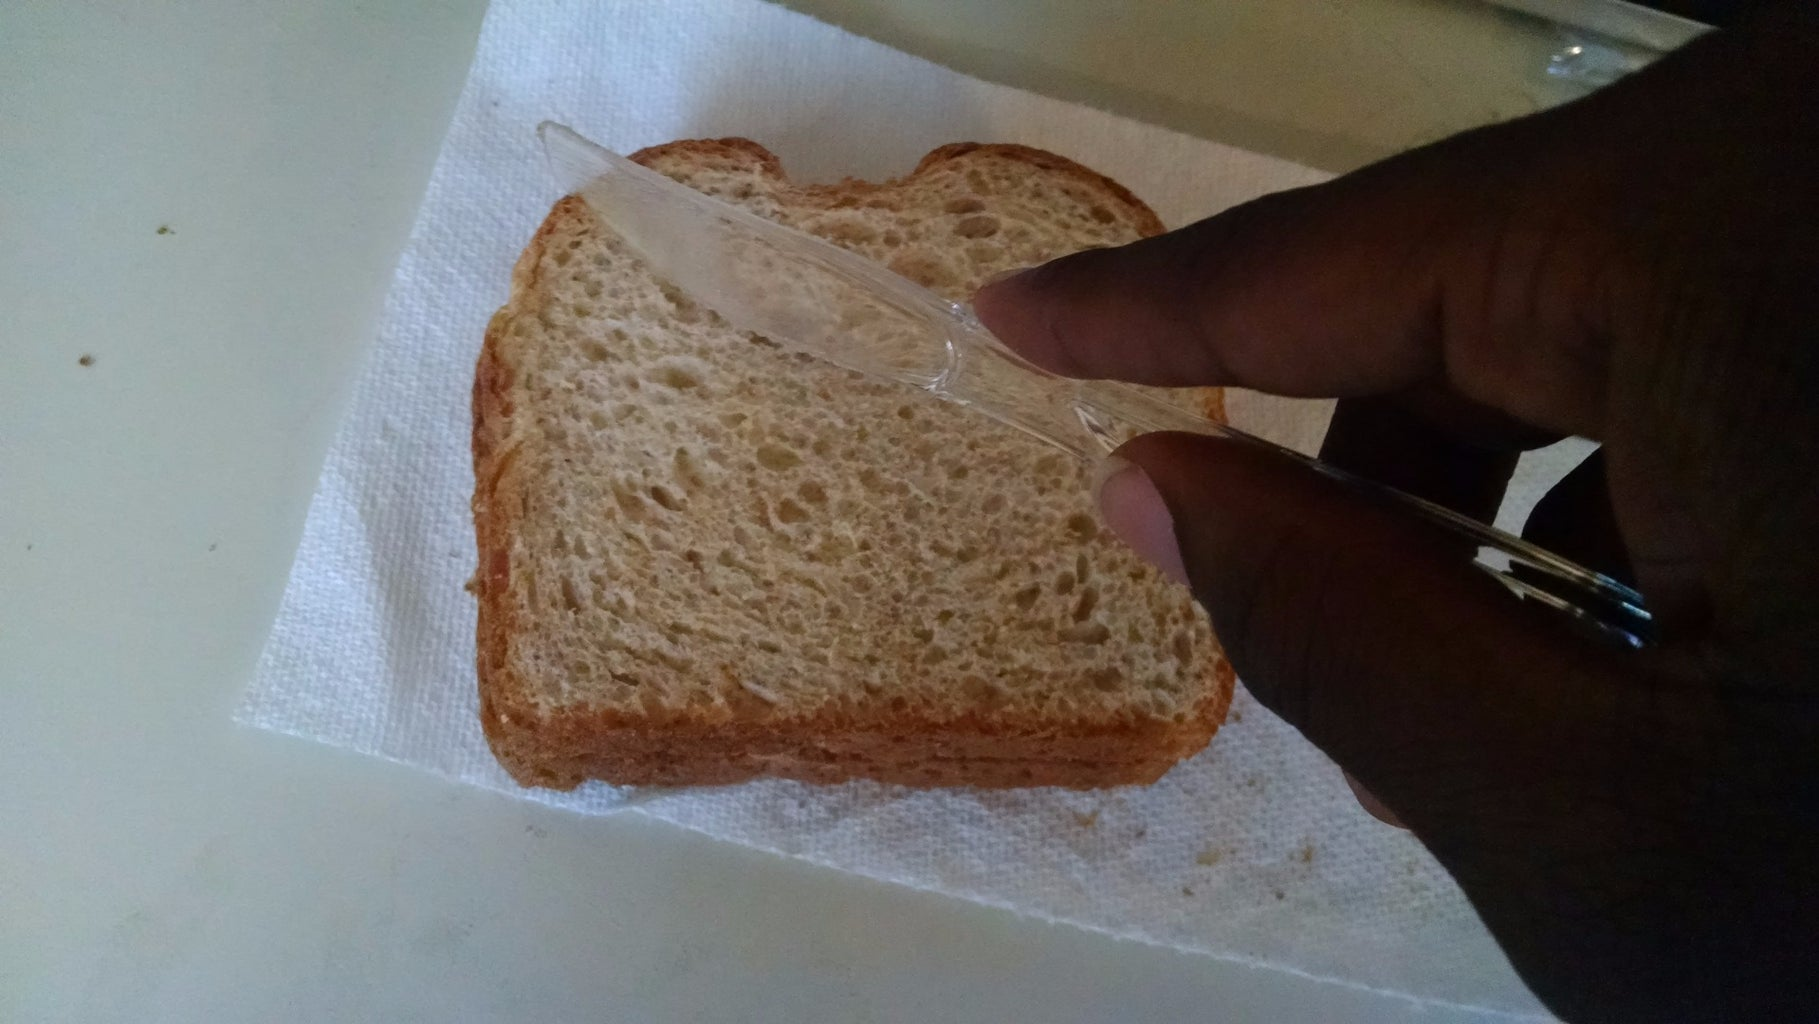 Cutting the Bread